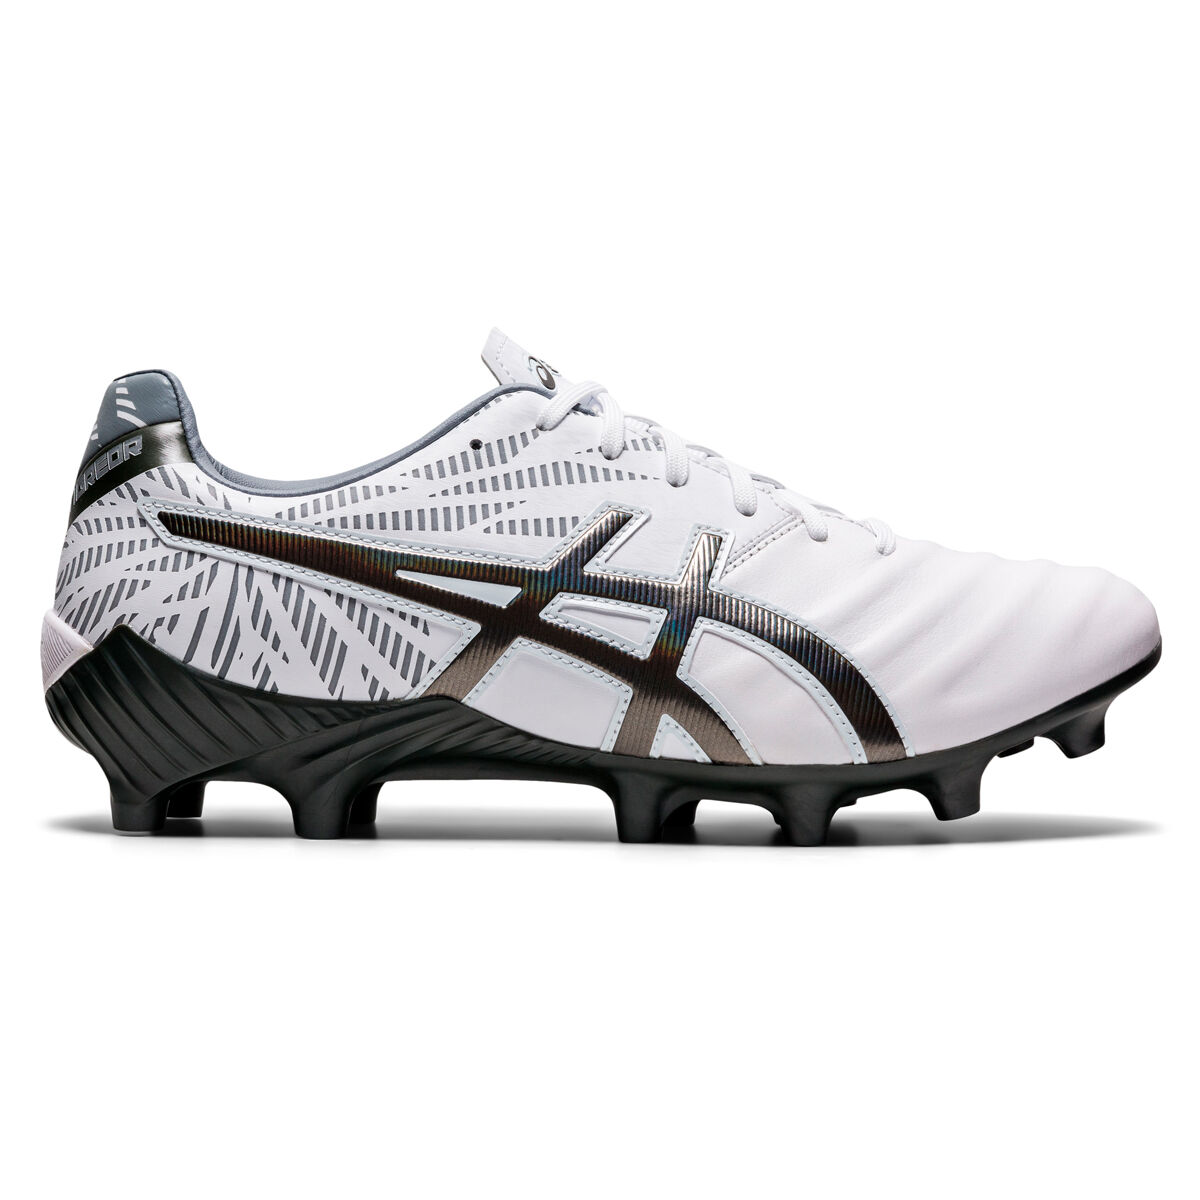 nike store jakarta roshe run women black sneakers | Asics Lethal Tigreor IT FF 2 Football Boots